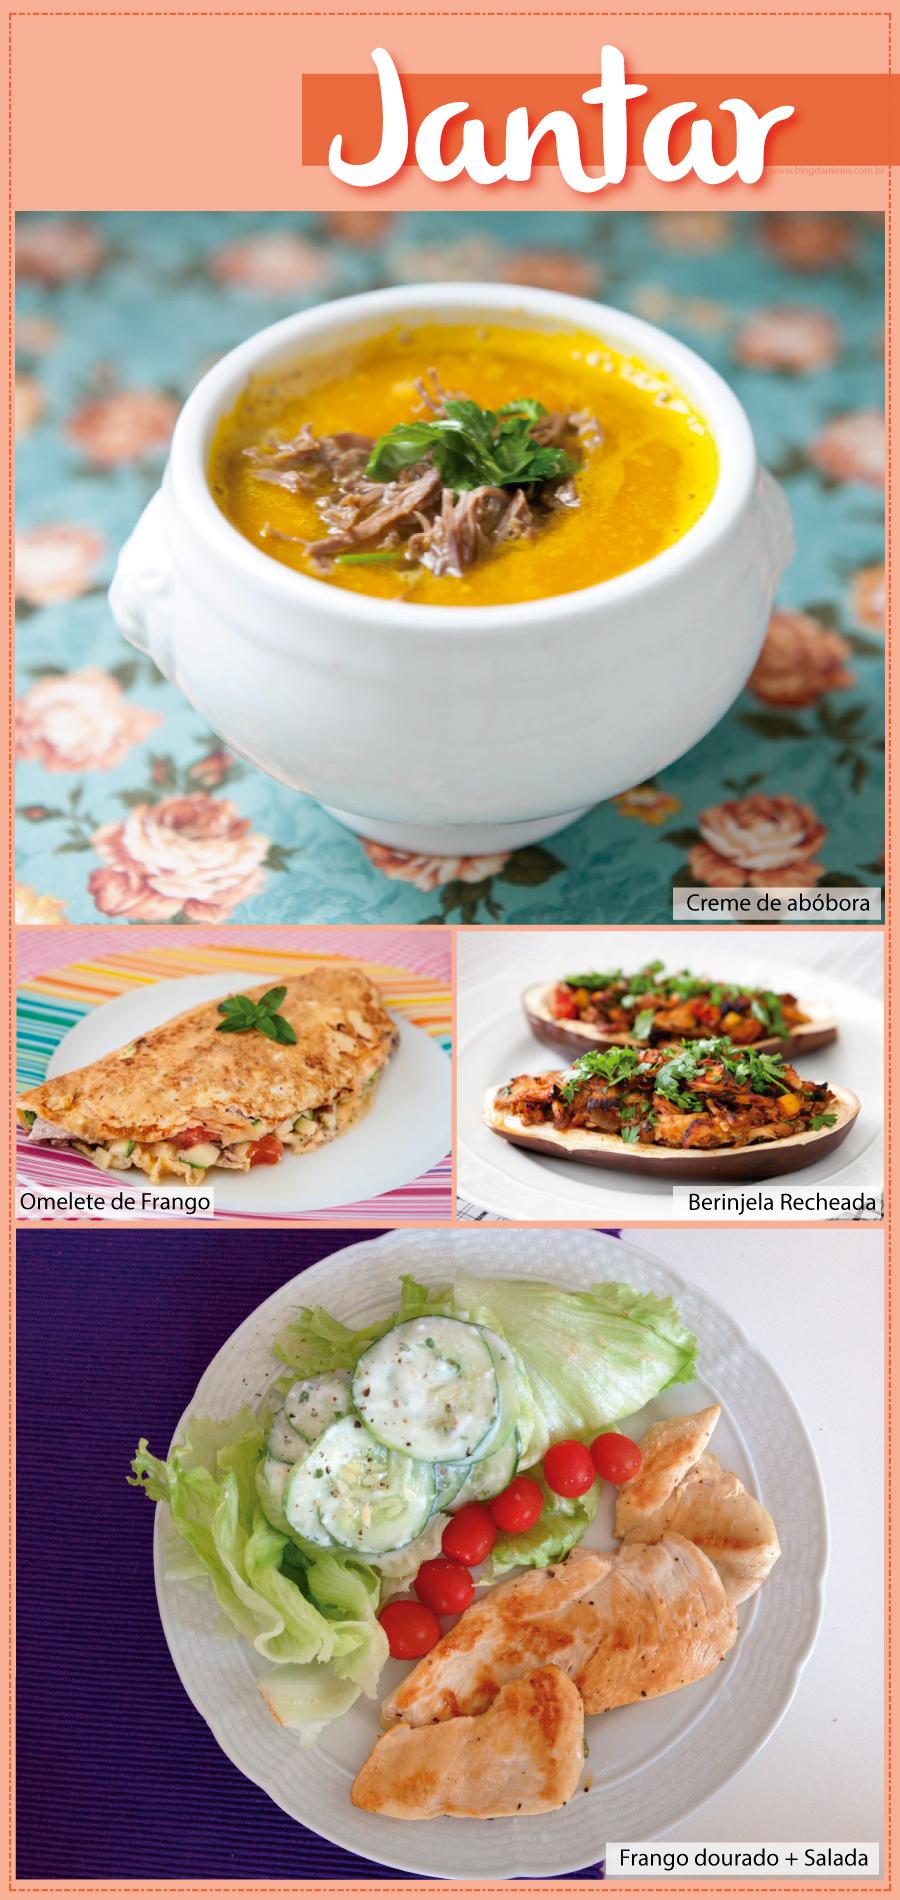 jantar-blog-da-mimis-michele-franzoni